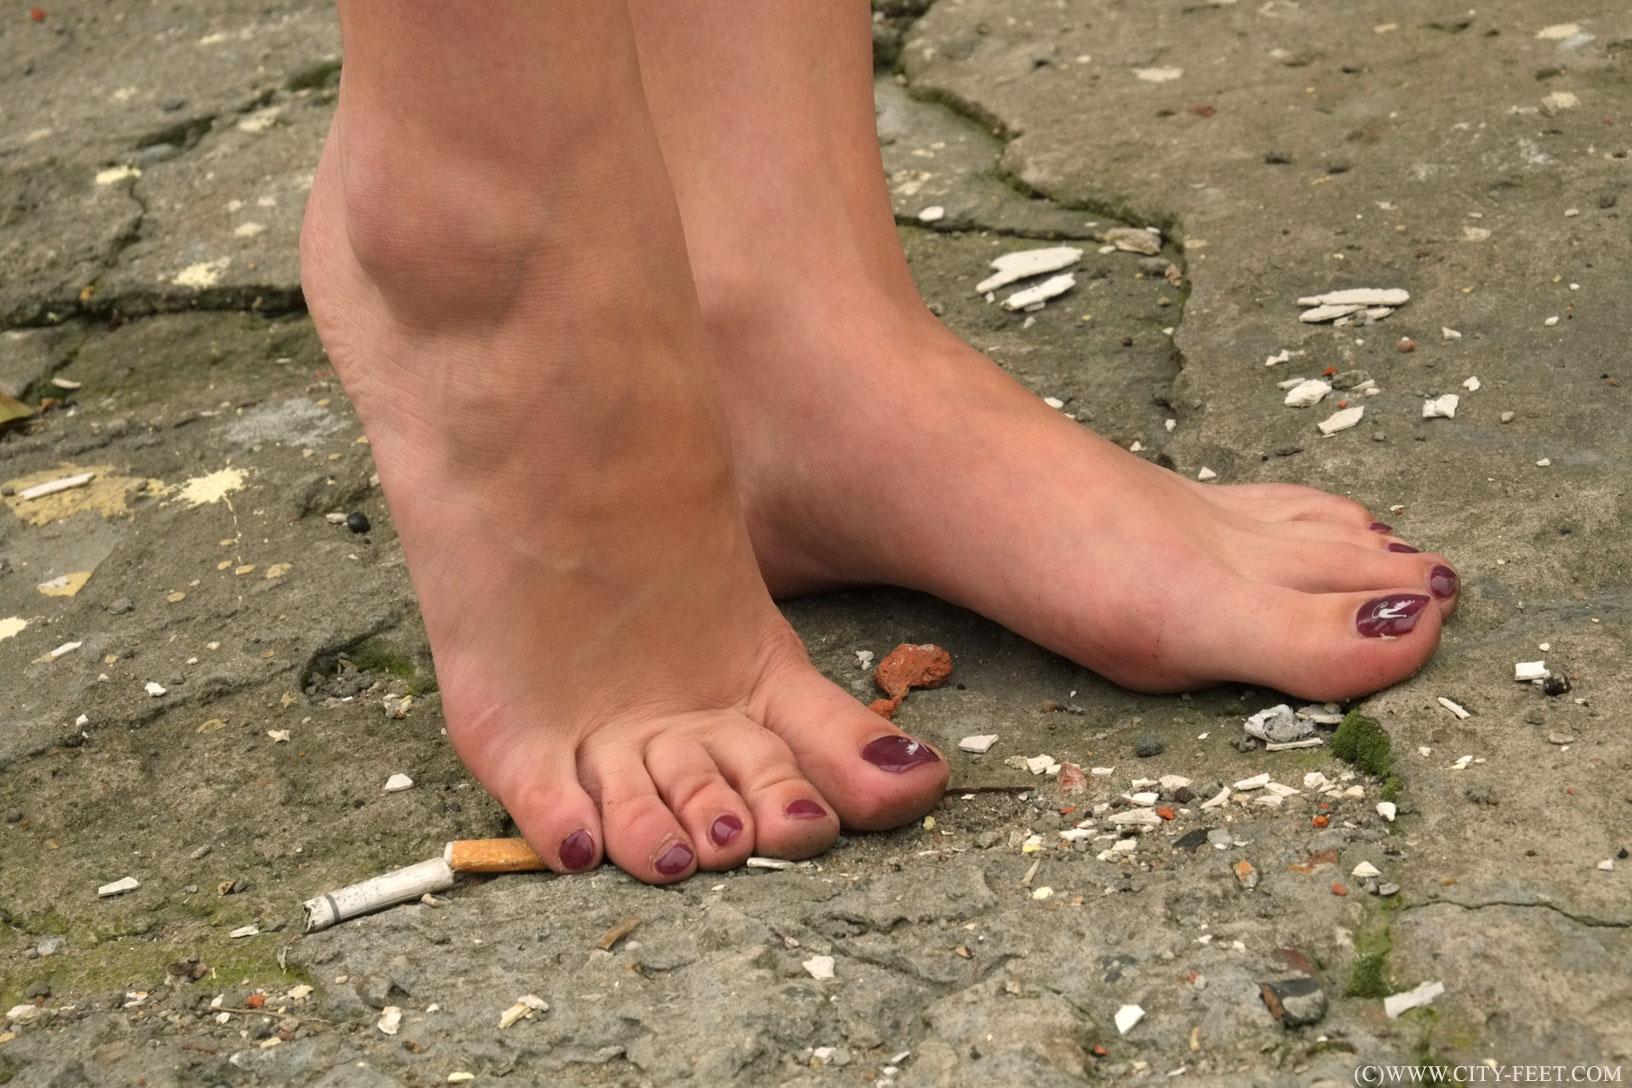 Foot fetish seual message